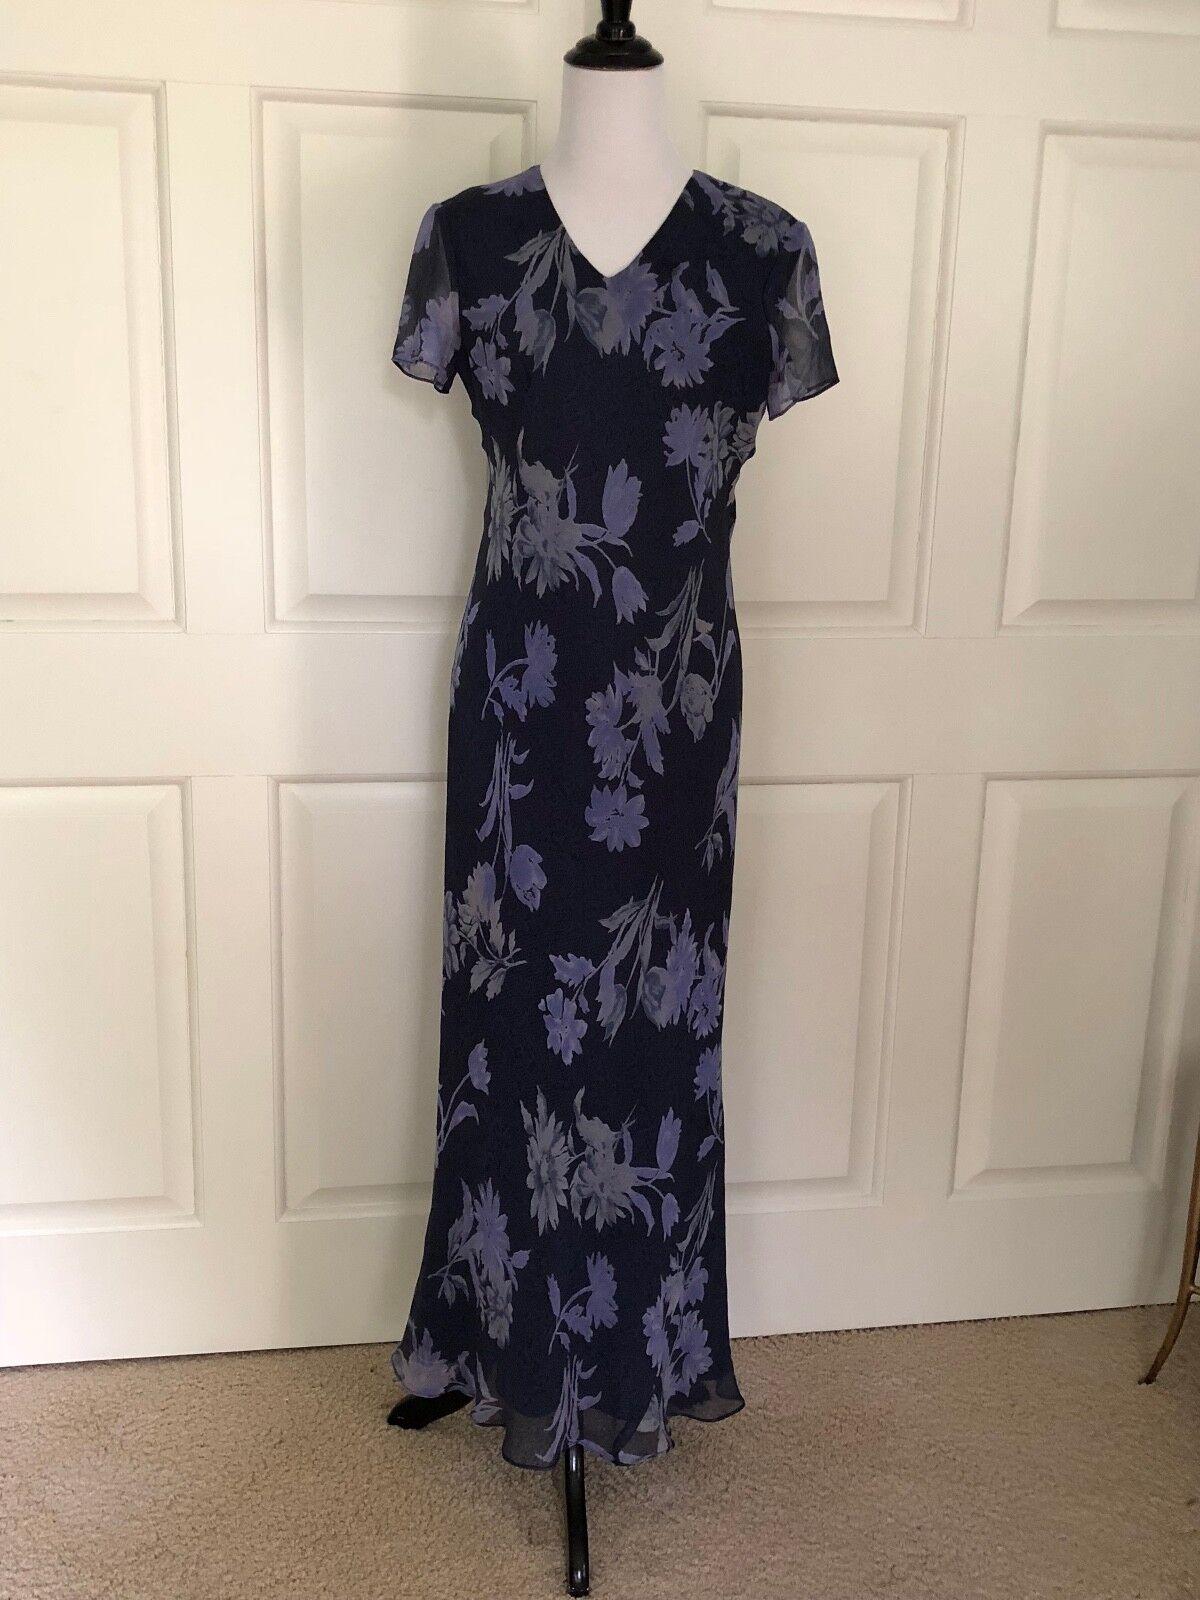 lila Blau  LAVENDER LONG SILK FLORAL DRESS FROM INC - Größe 6 - EUC